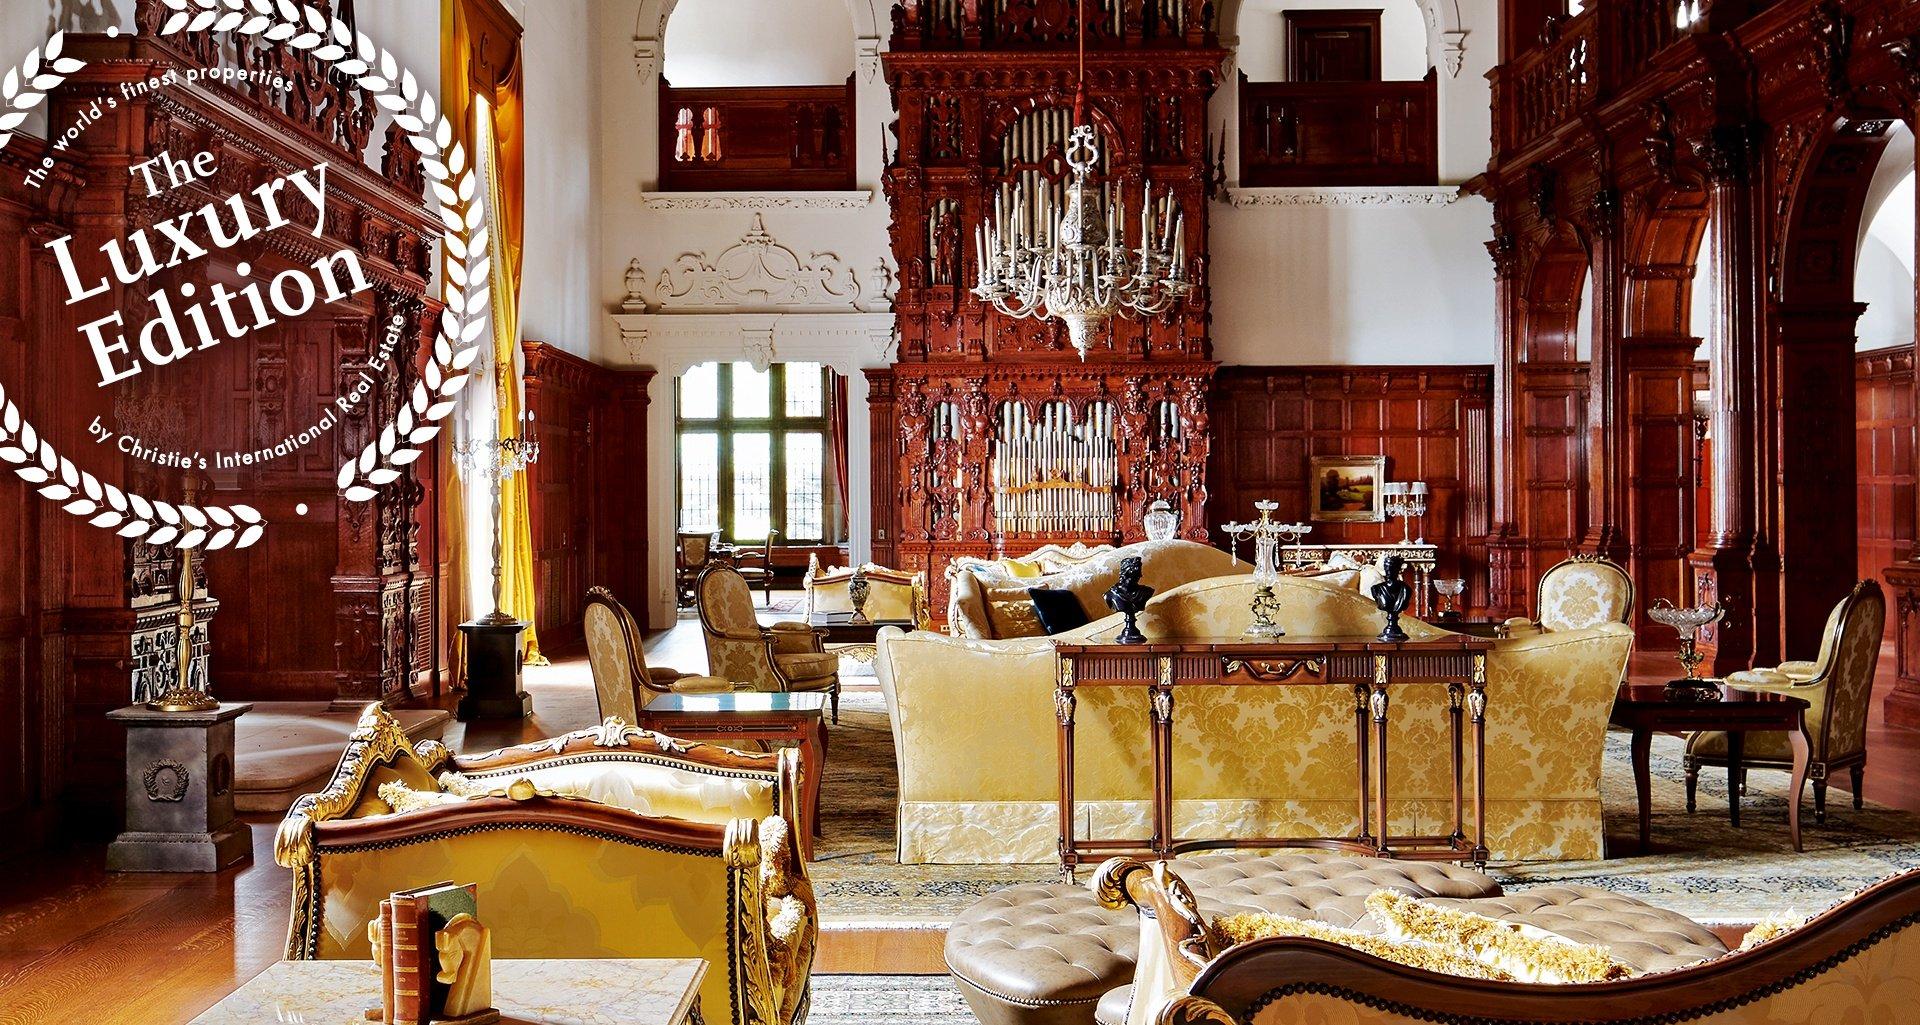 Luxury Edition - World's Finest Properties